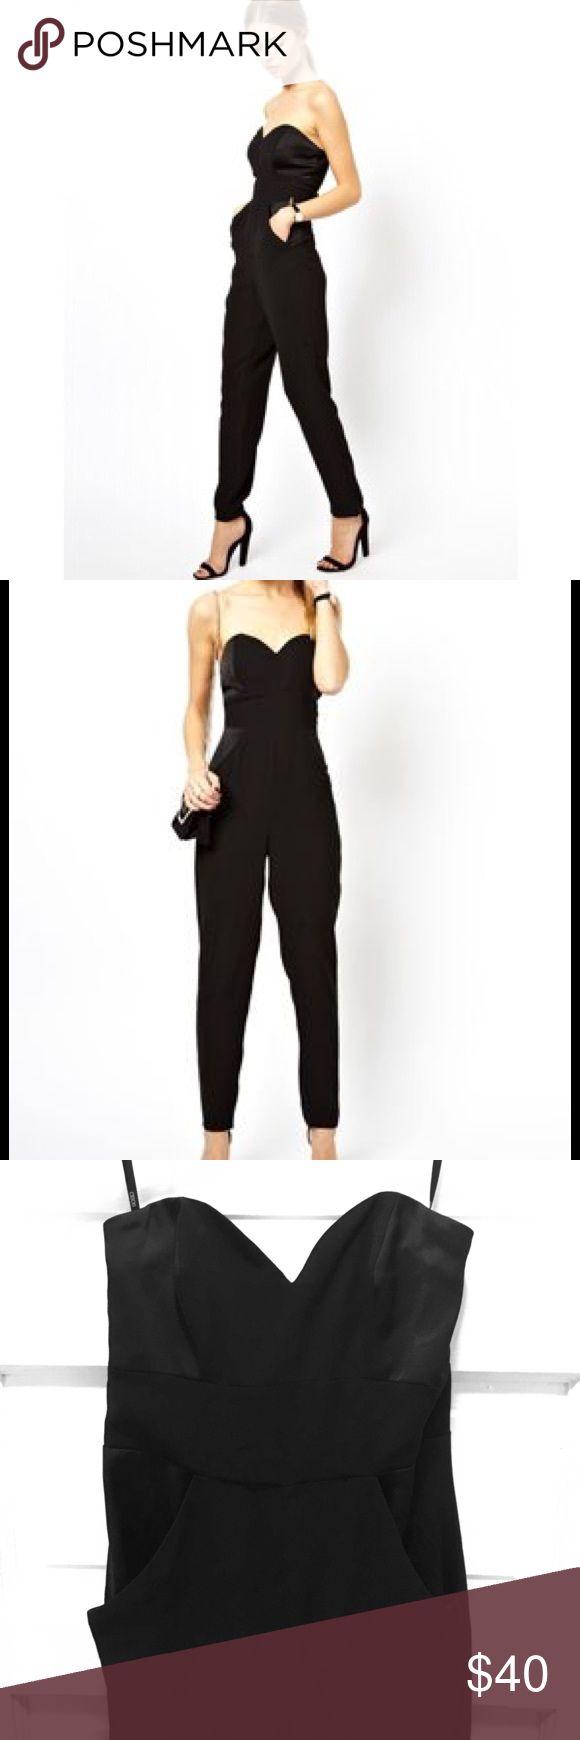 Bandeau jumpsuit Brand new never worn before bandeau jumpsuit with deep plunge neck. ASOS Pants Jumpsuits & Rompers